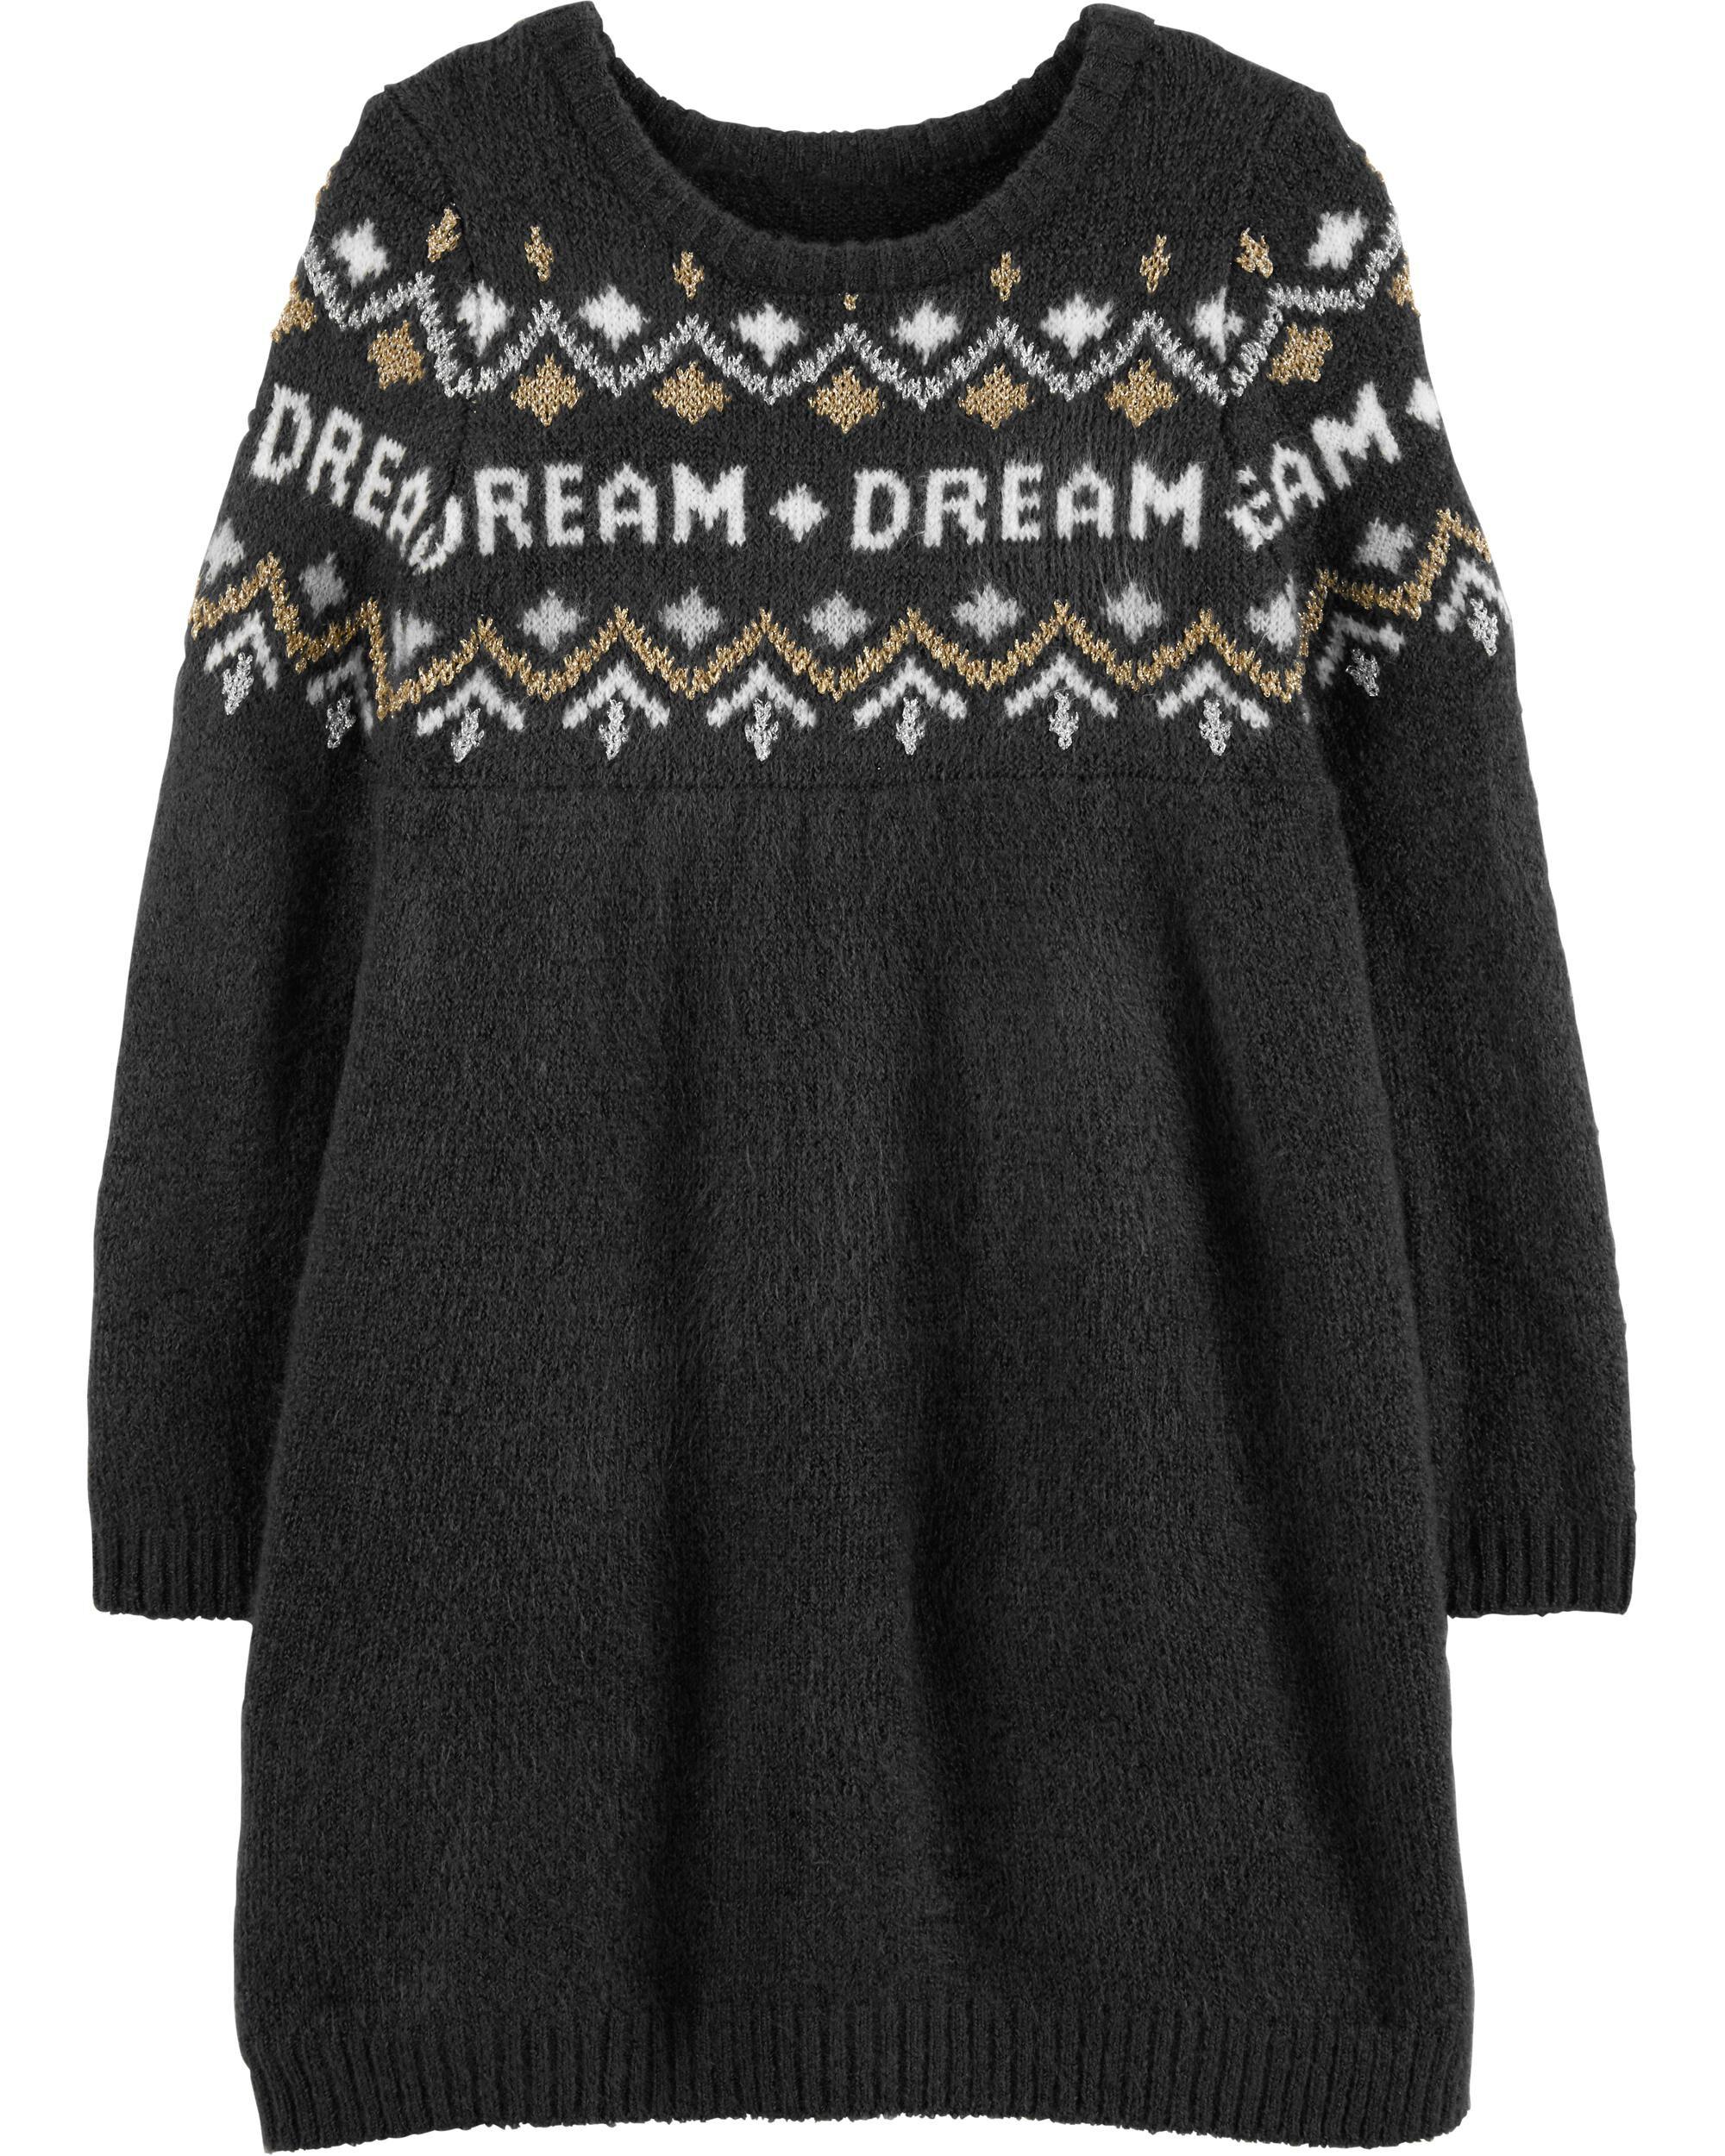 *Clearance*  Glitter Dream Sweater Dress